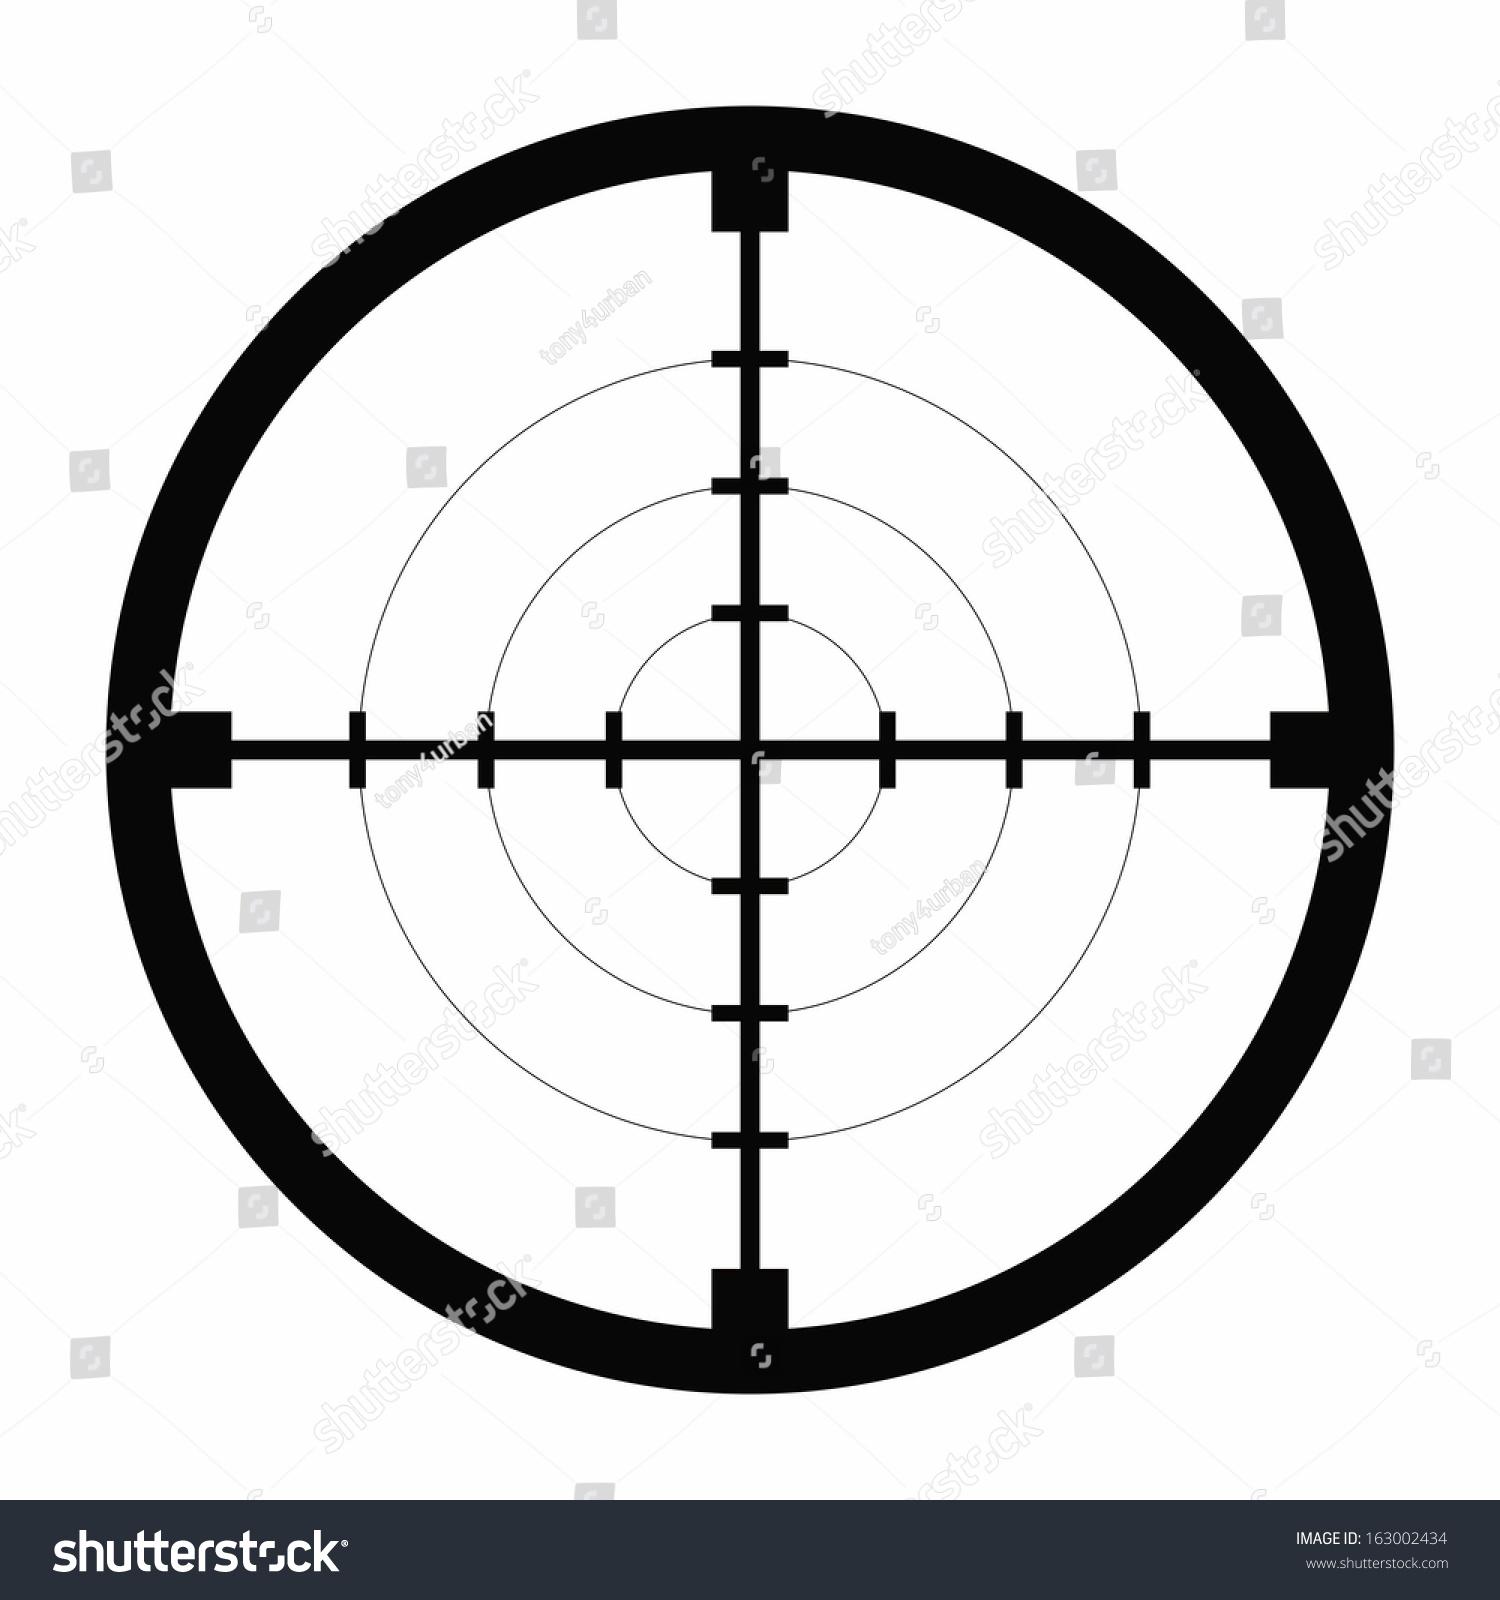 sniper black finder target illustration bull stock vector